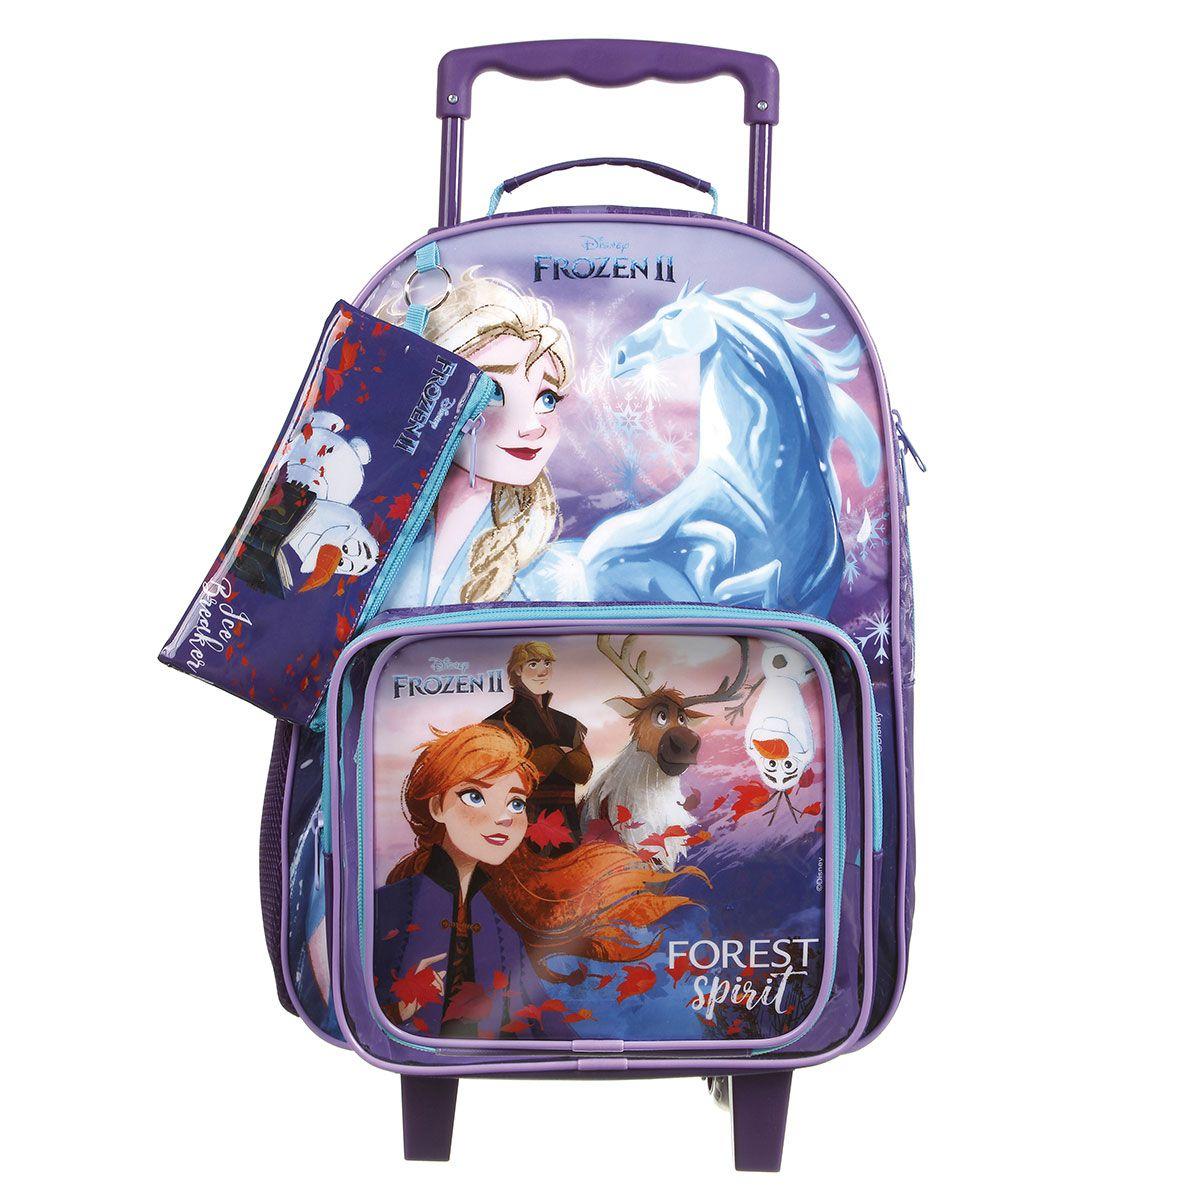 Kit Mochilete Escolar Frozen II Disney + Lancheira + Estojo Oficial